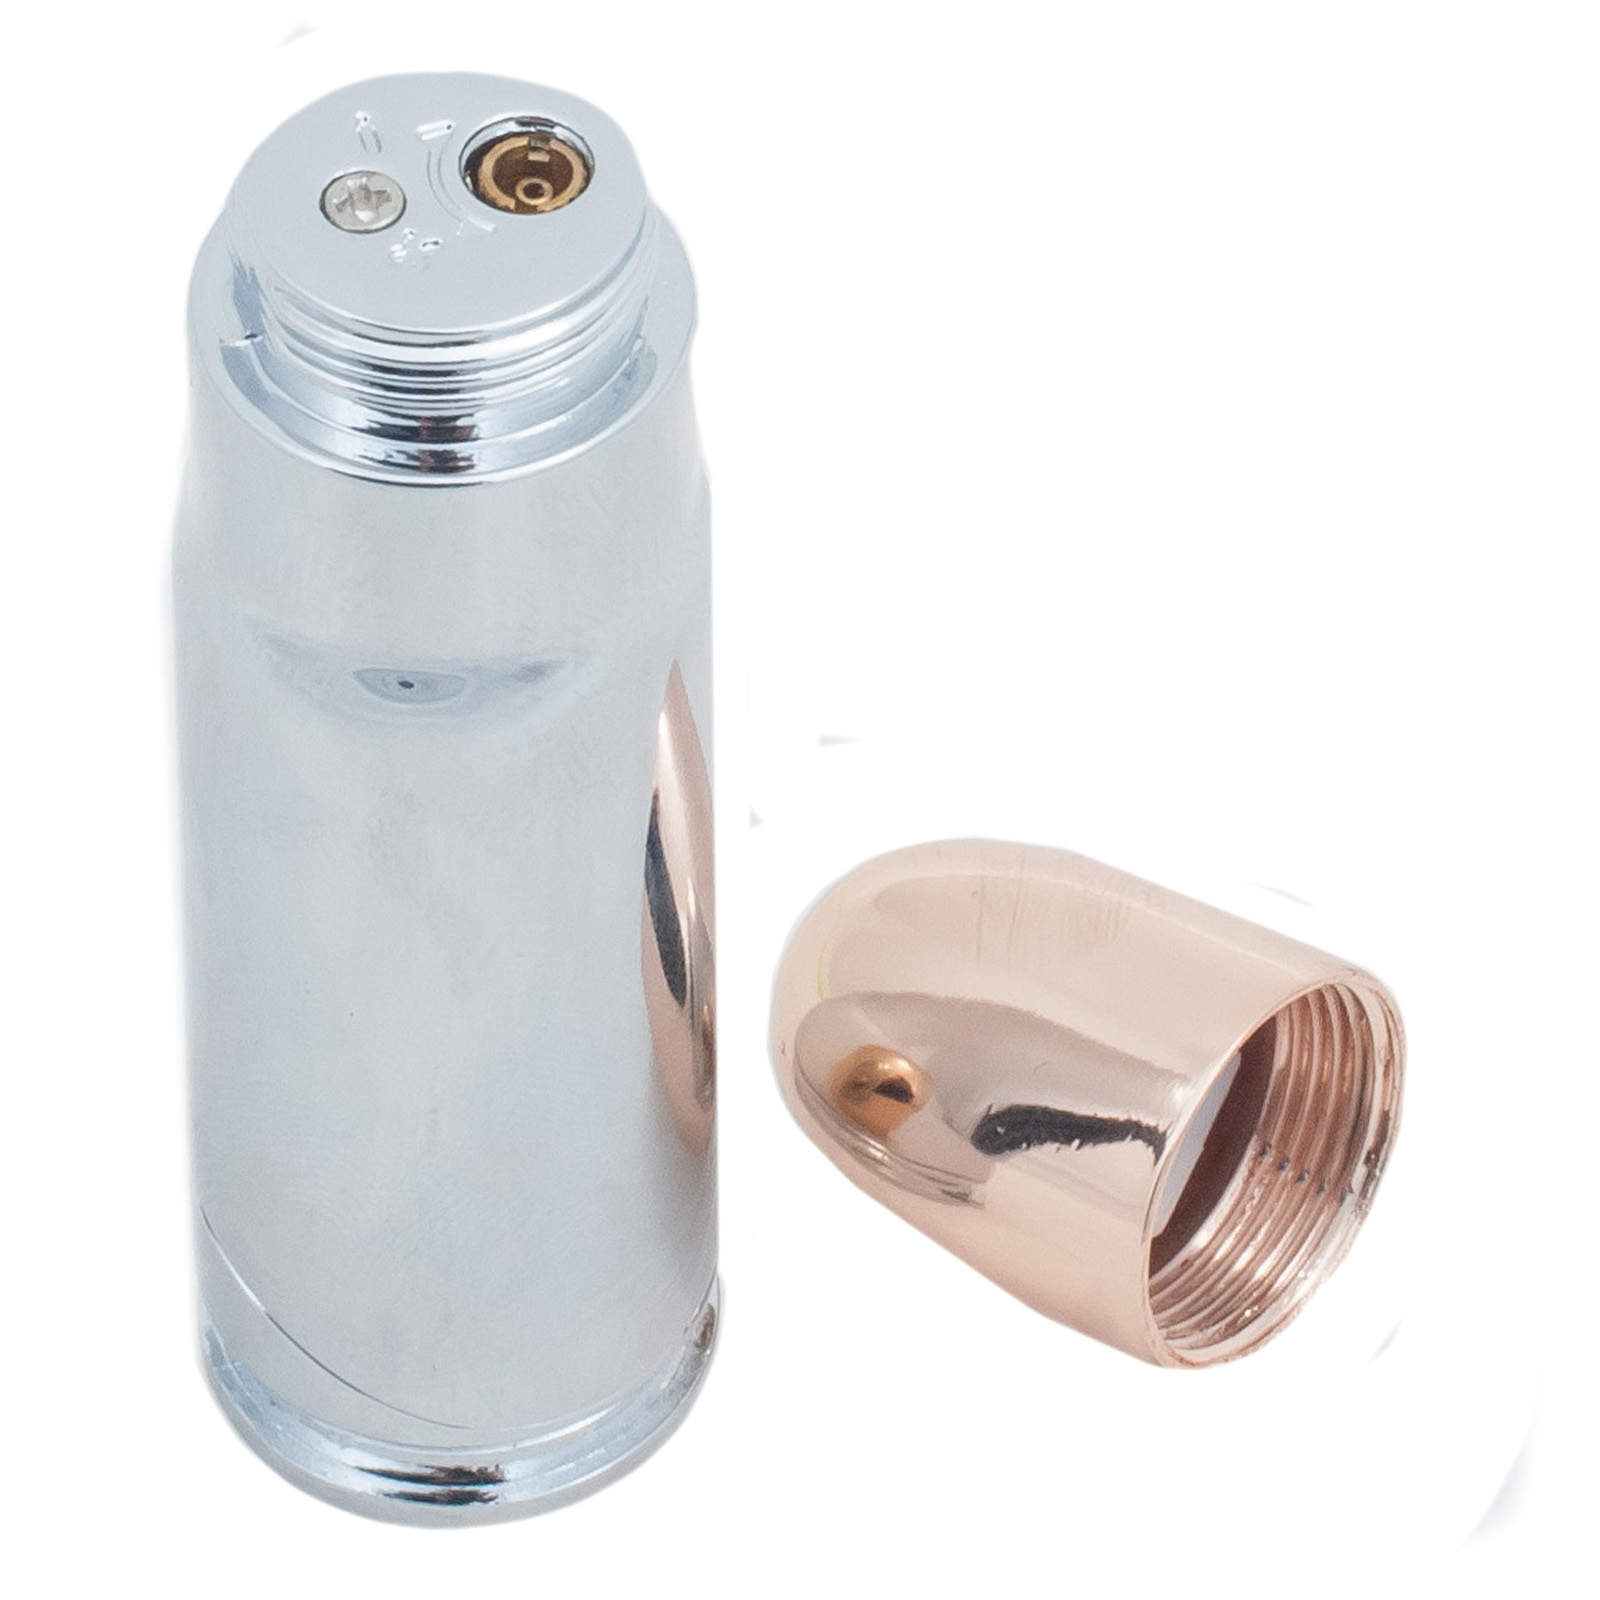 Зажигалка-пуля с фонариком